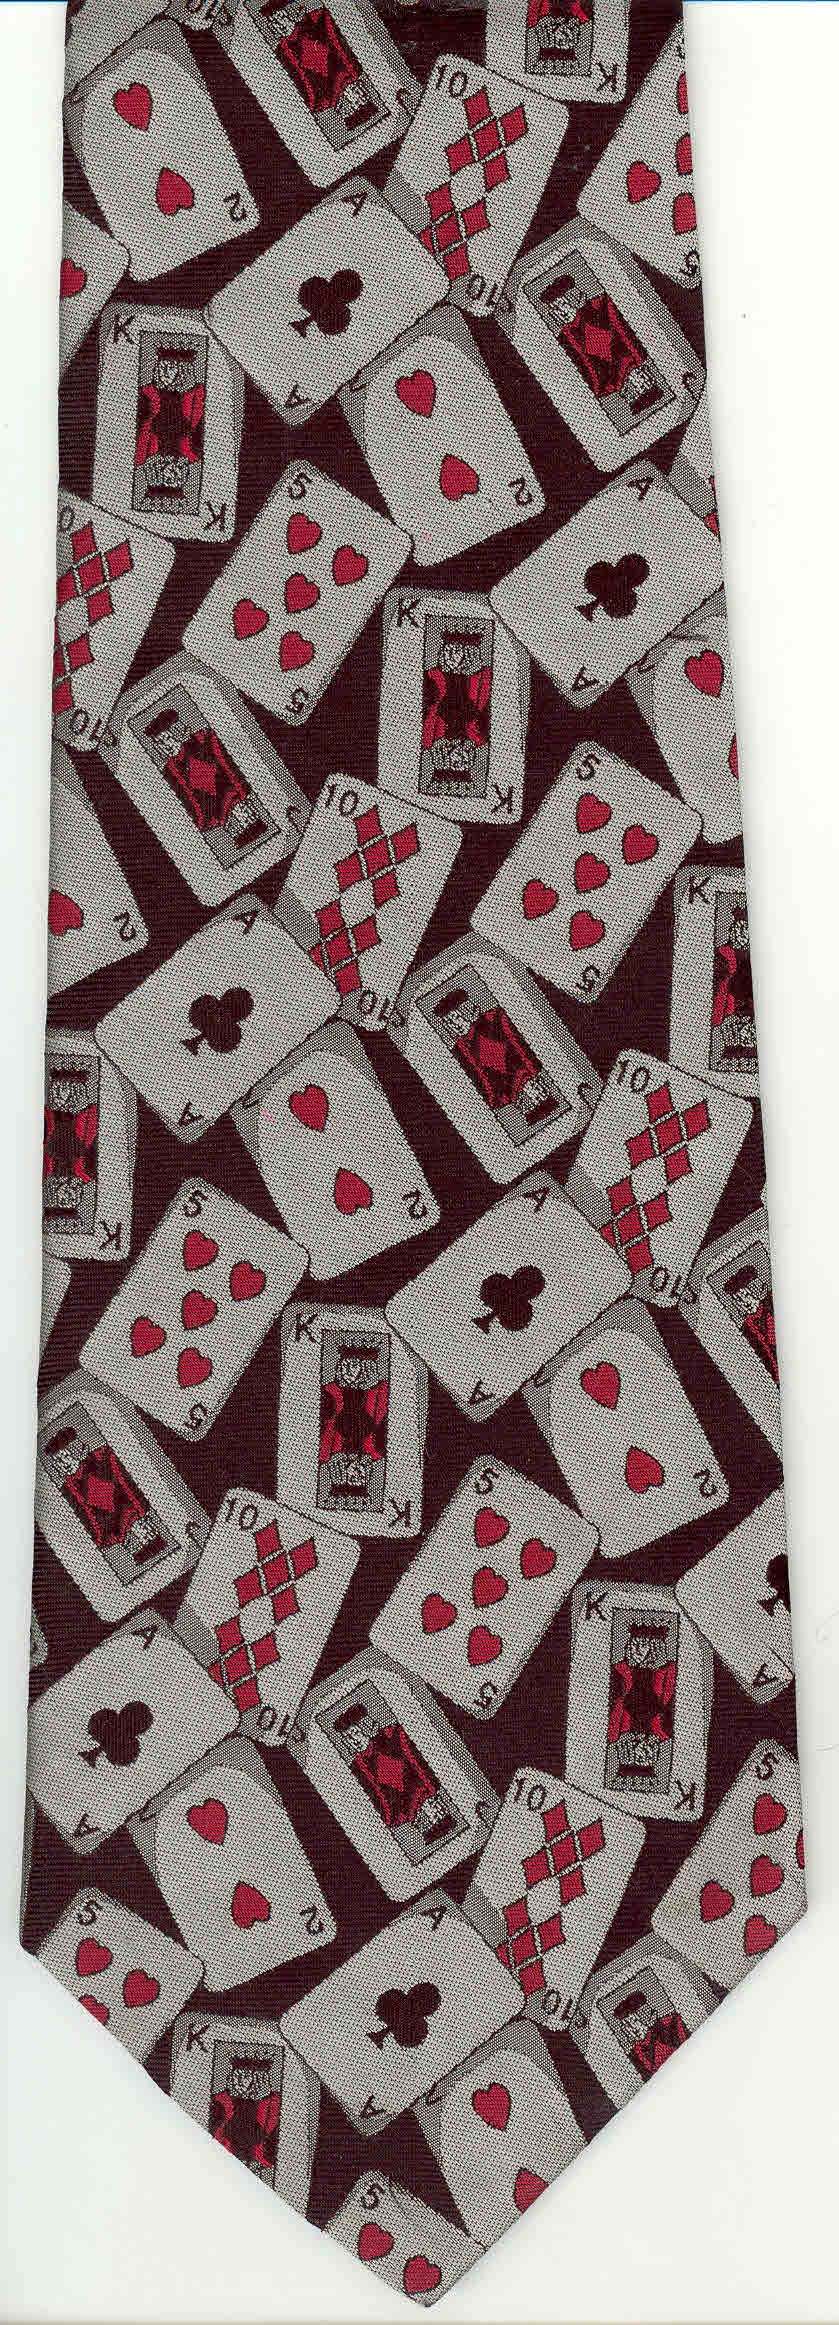 002 Gray Cards.jpg